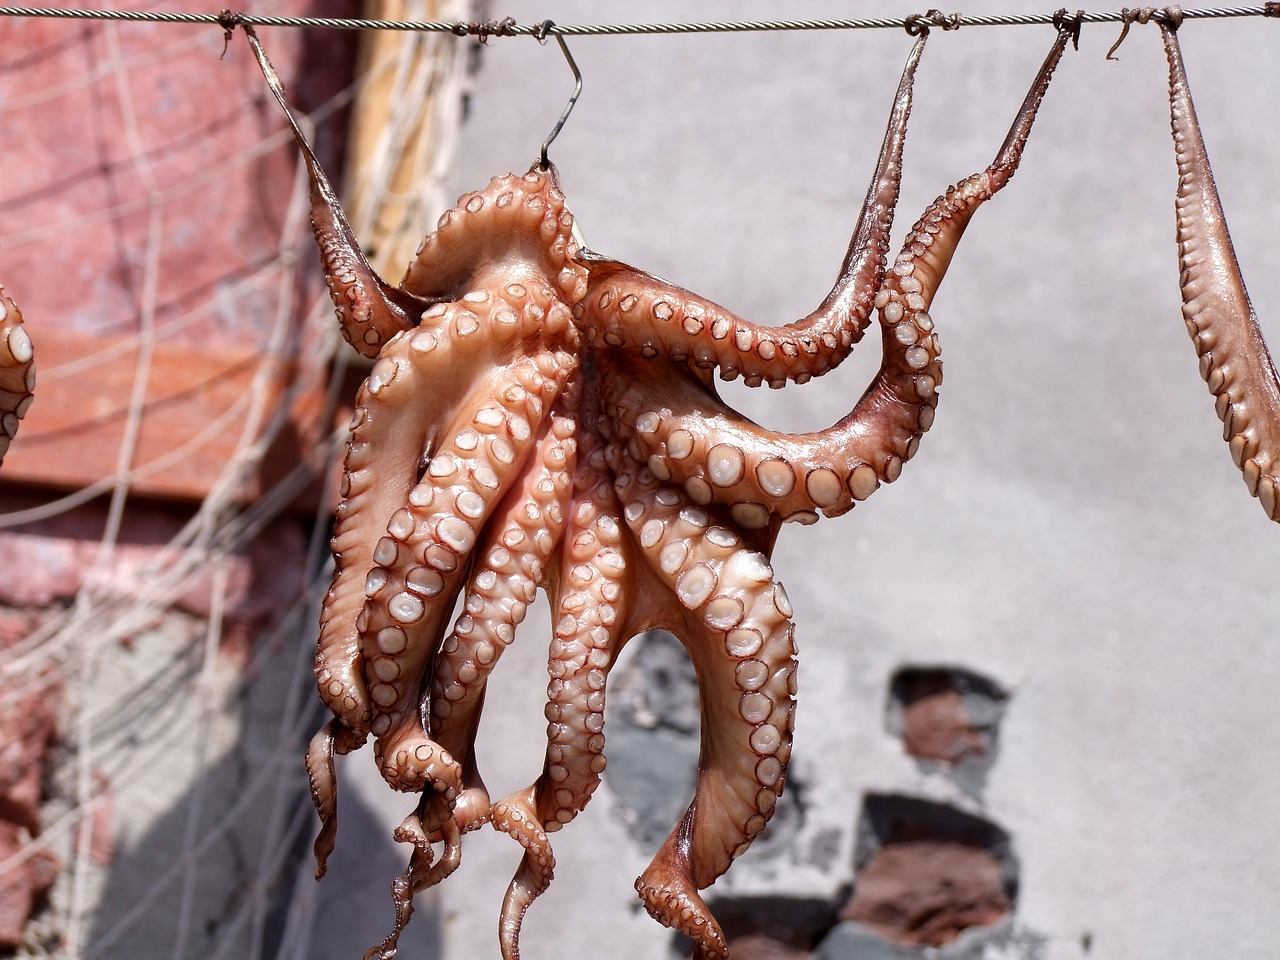 squid-689385_1280.jpg